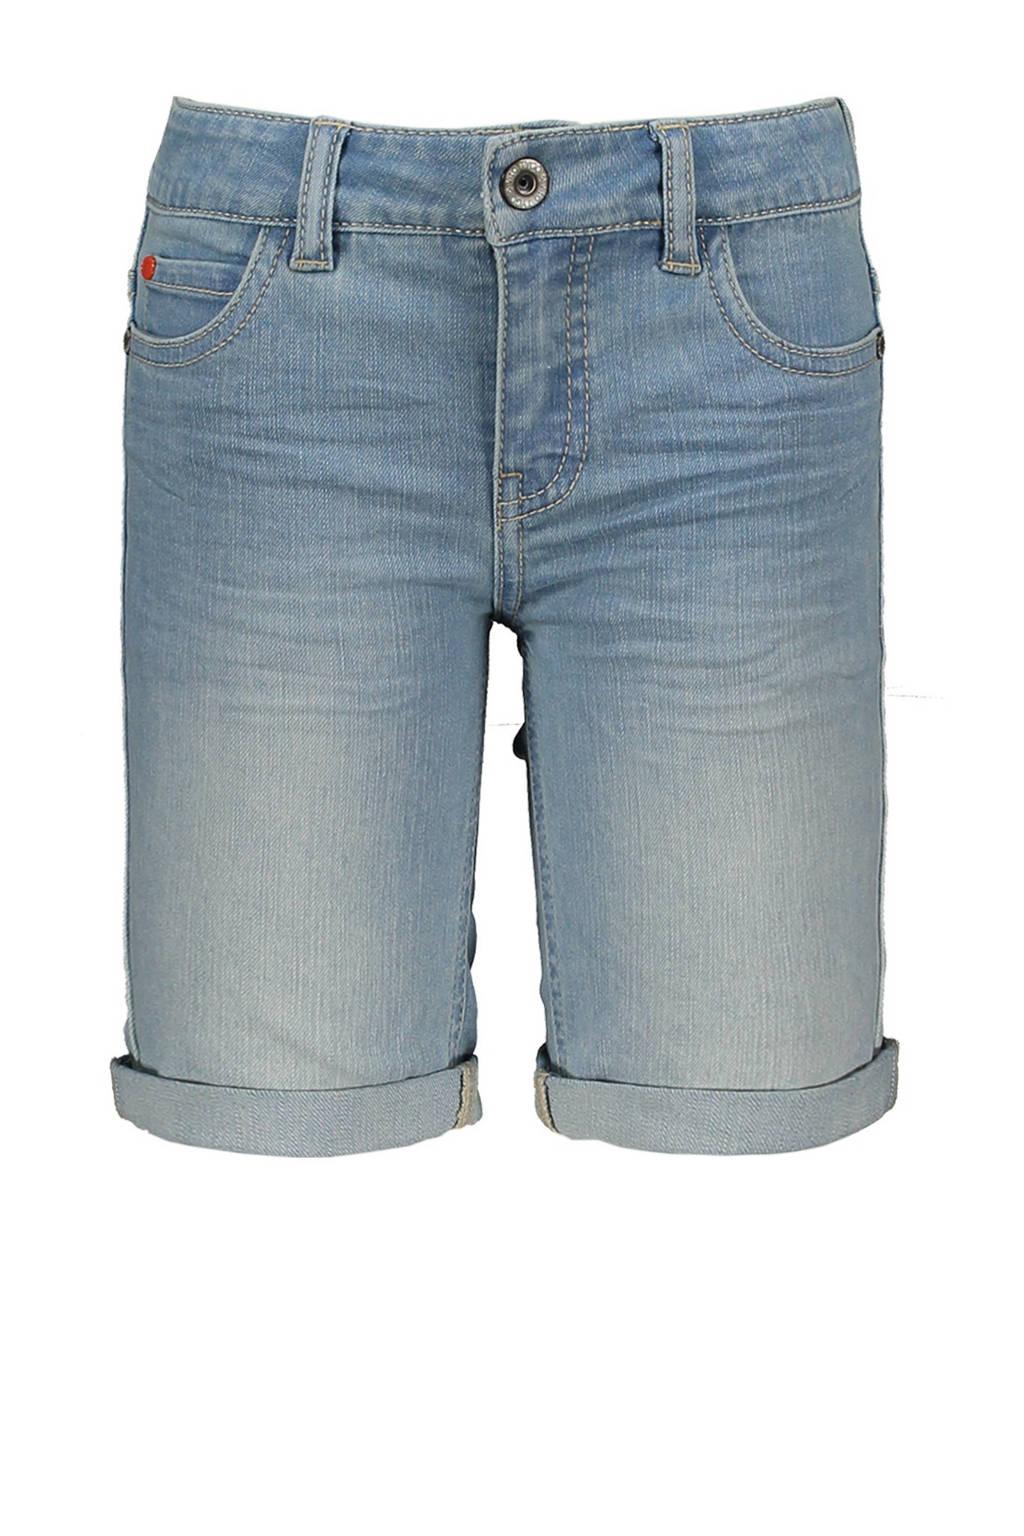 TYGO & vito slim fit jeans bermuda light denim, Light denim